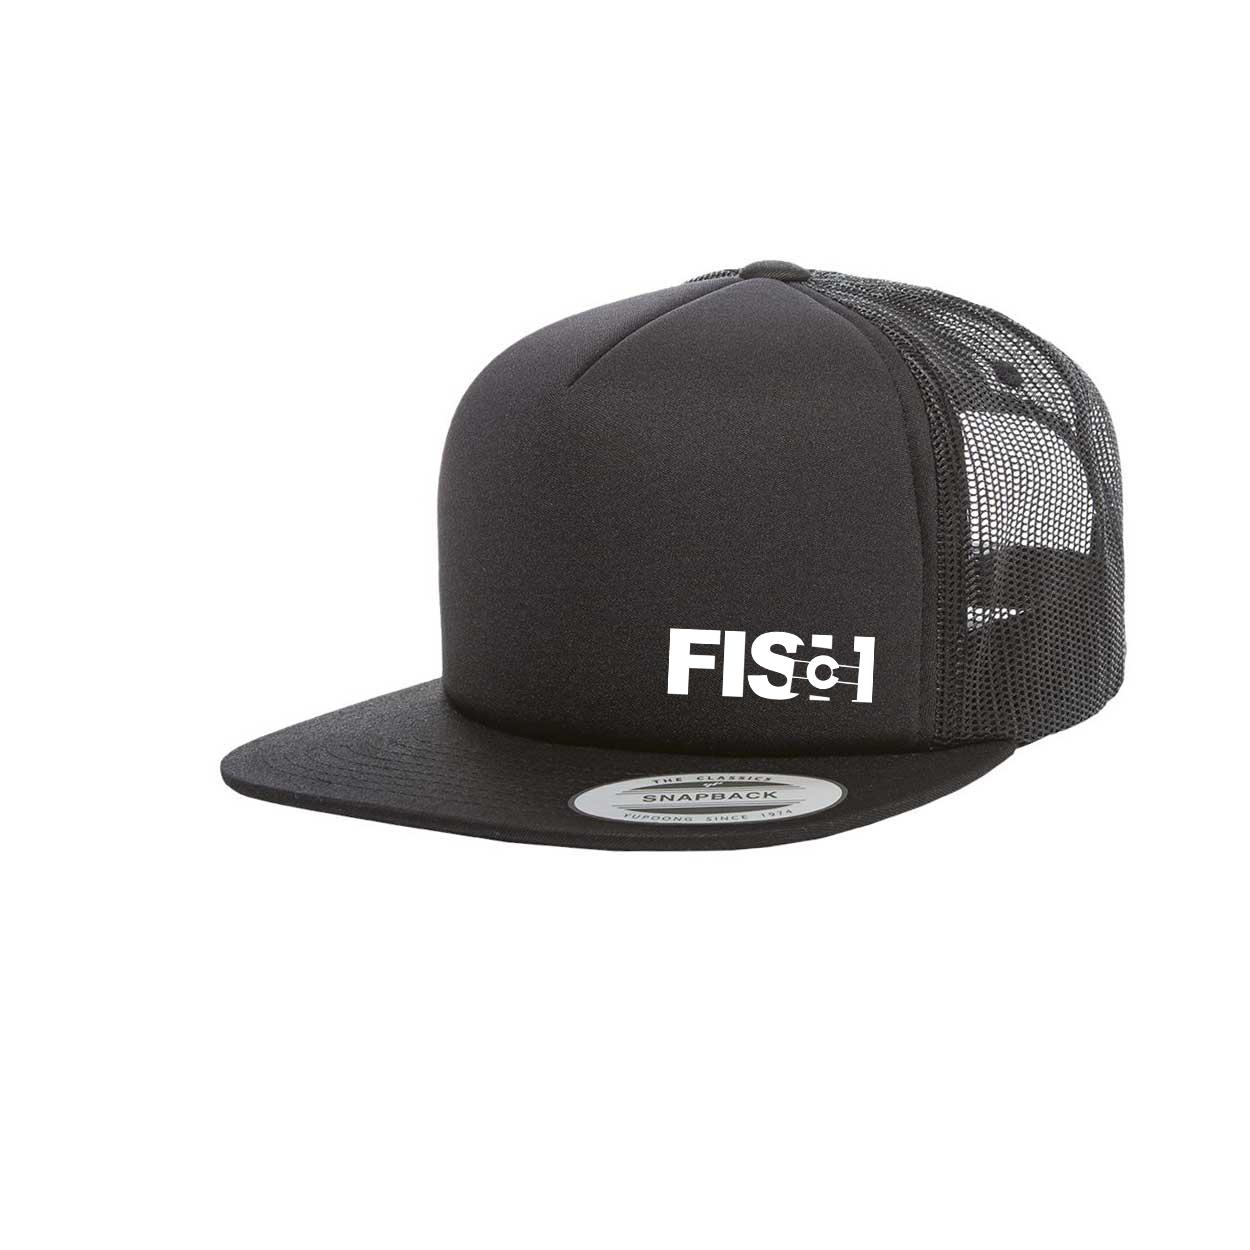 Fish Colorado Night Out Premium Foam Flat Brim Snapback Hat Black (White Logo)